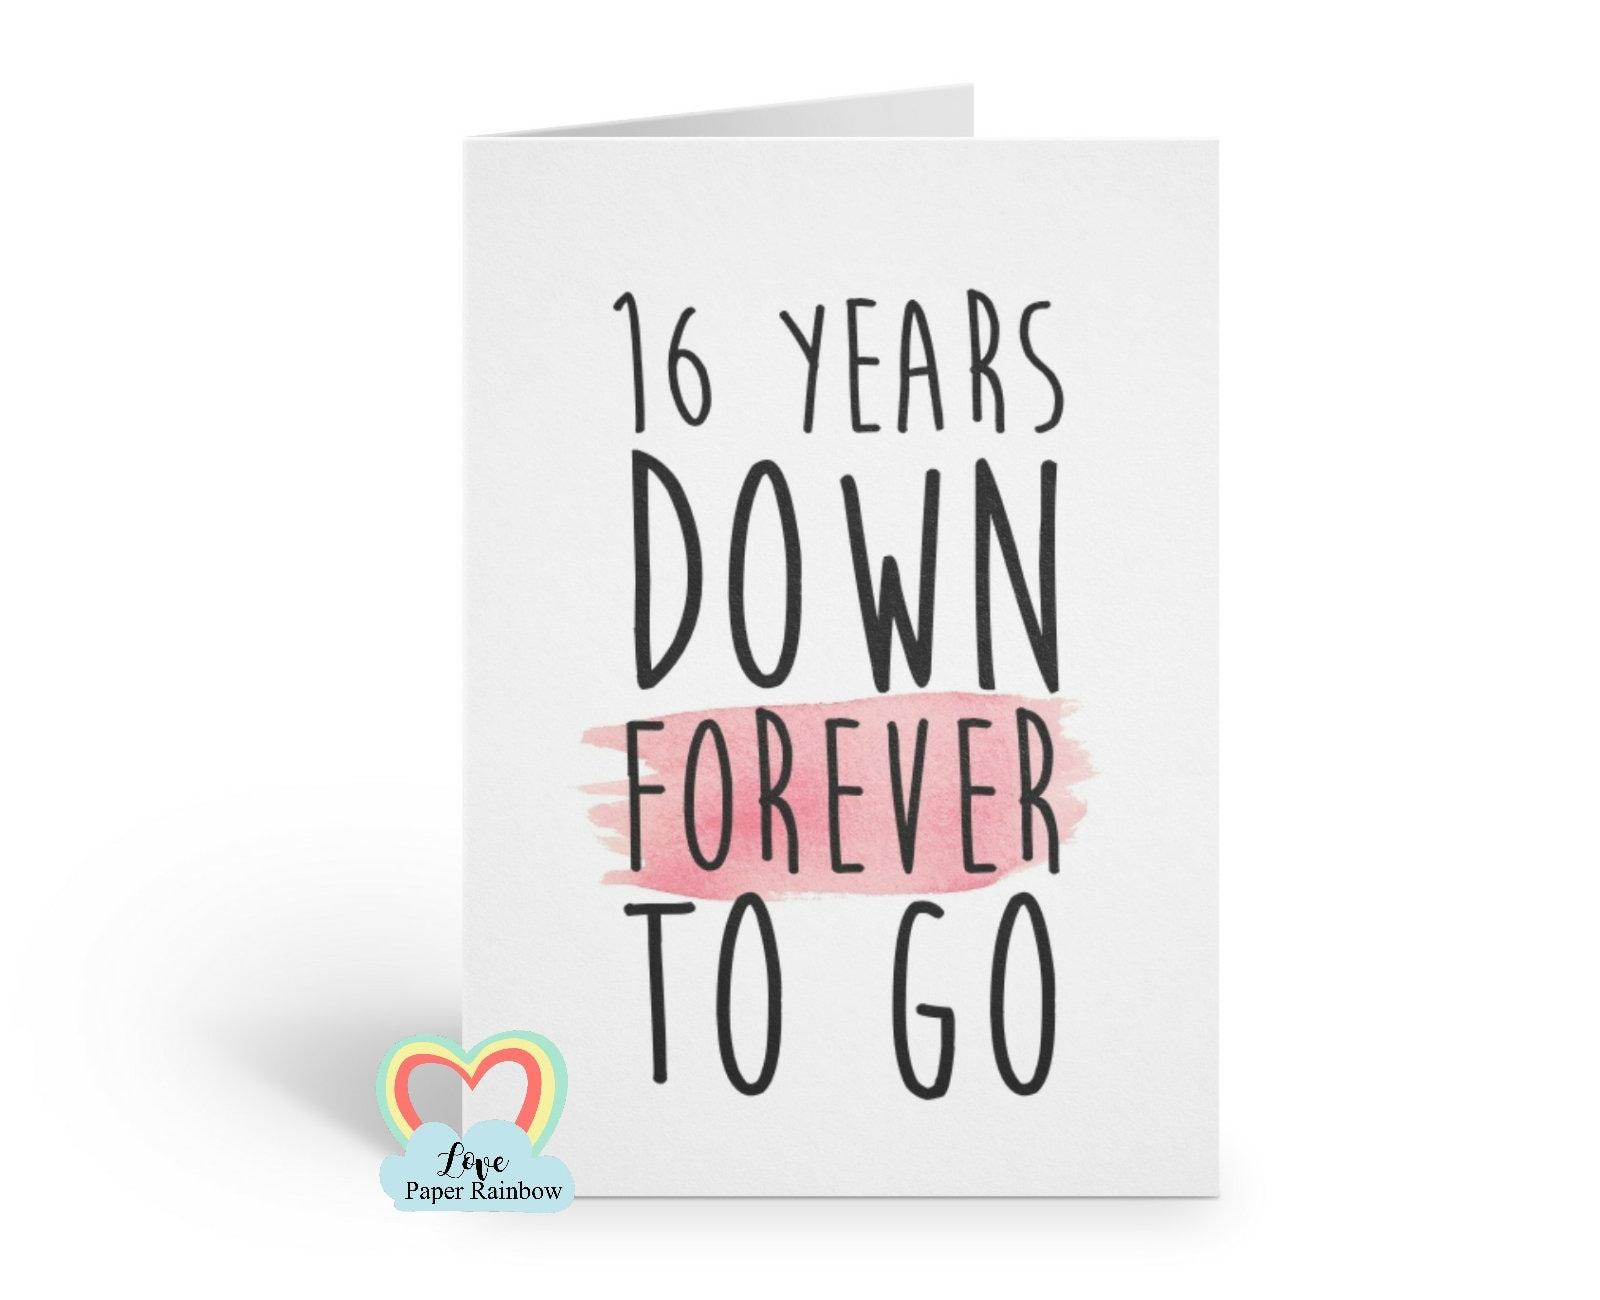 16th Wedding Anniversary.16th Anniversary Card 16th Wedding Anniversary Card 16 Years Down